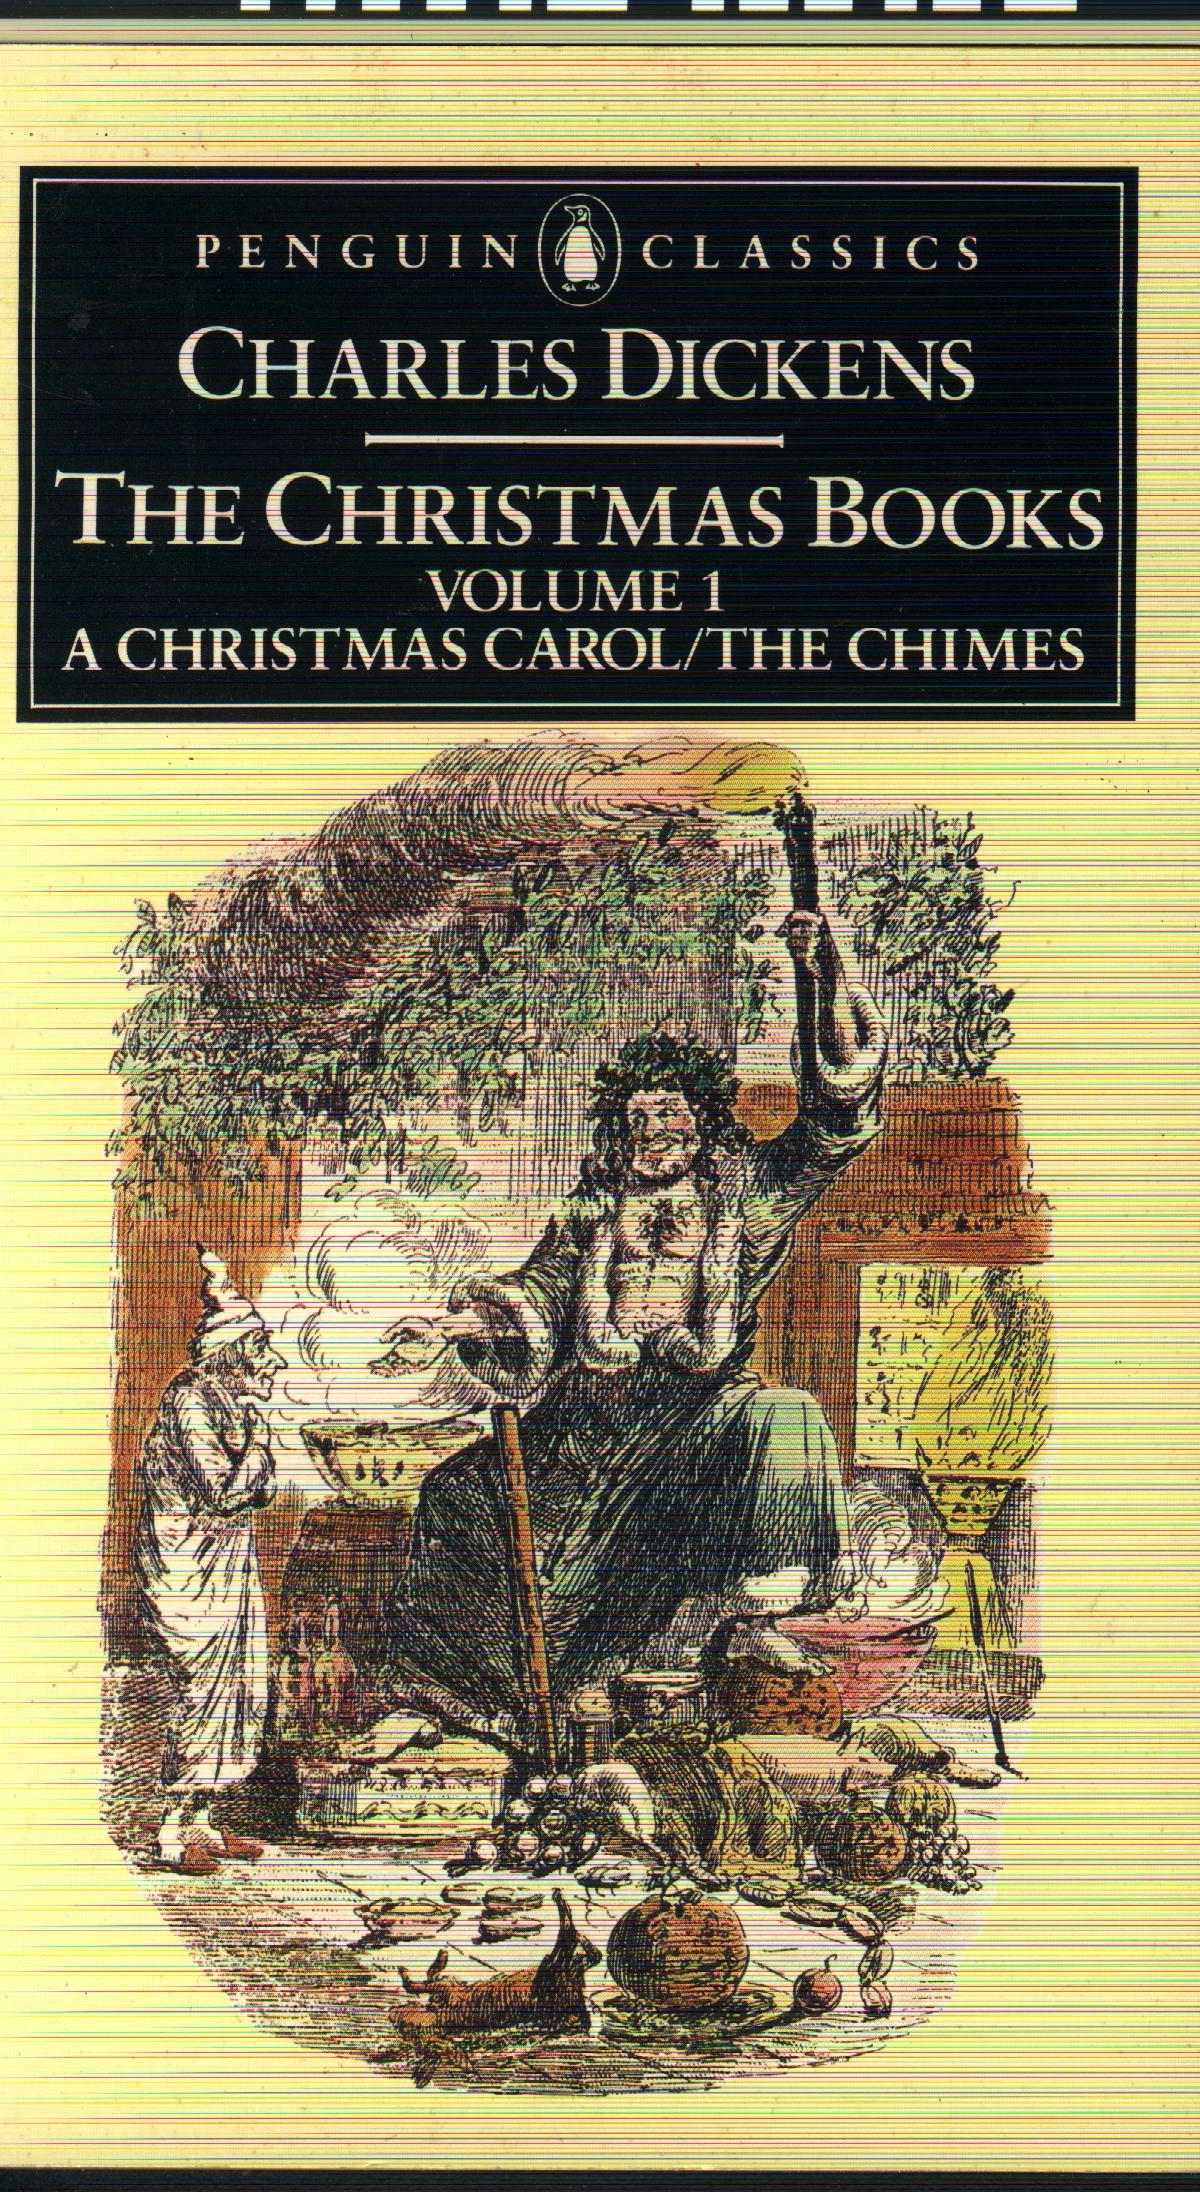 The Christmas Books, Volume 1